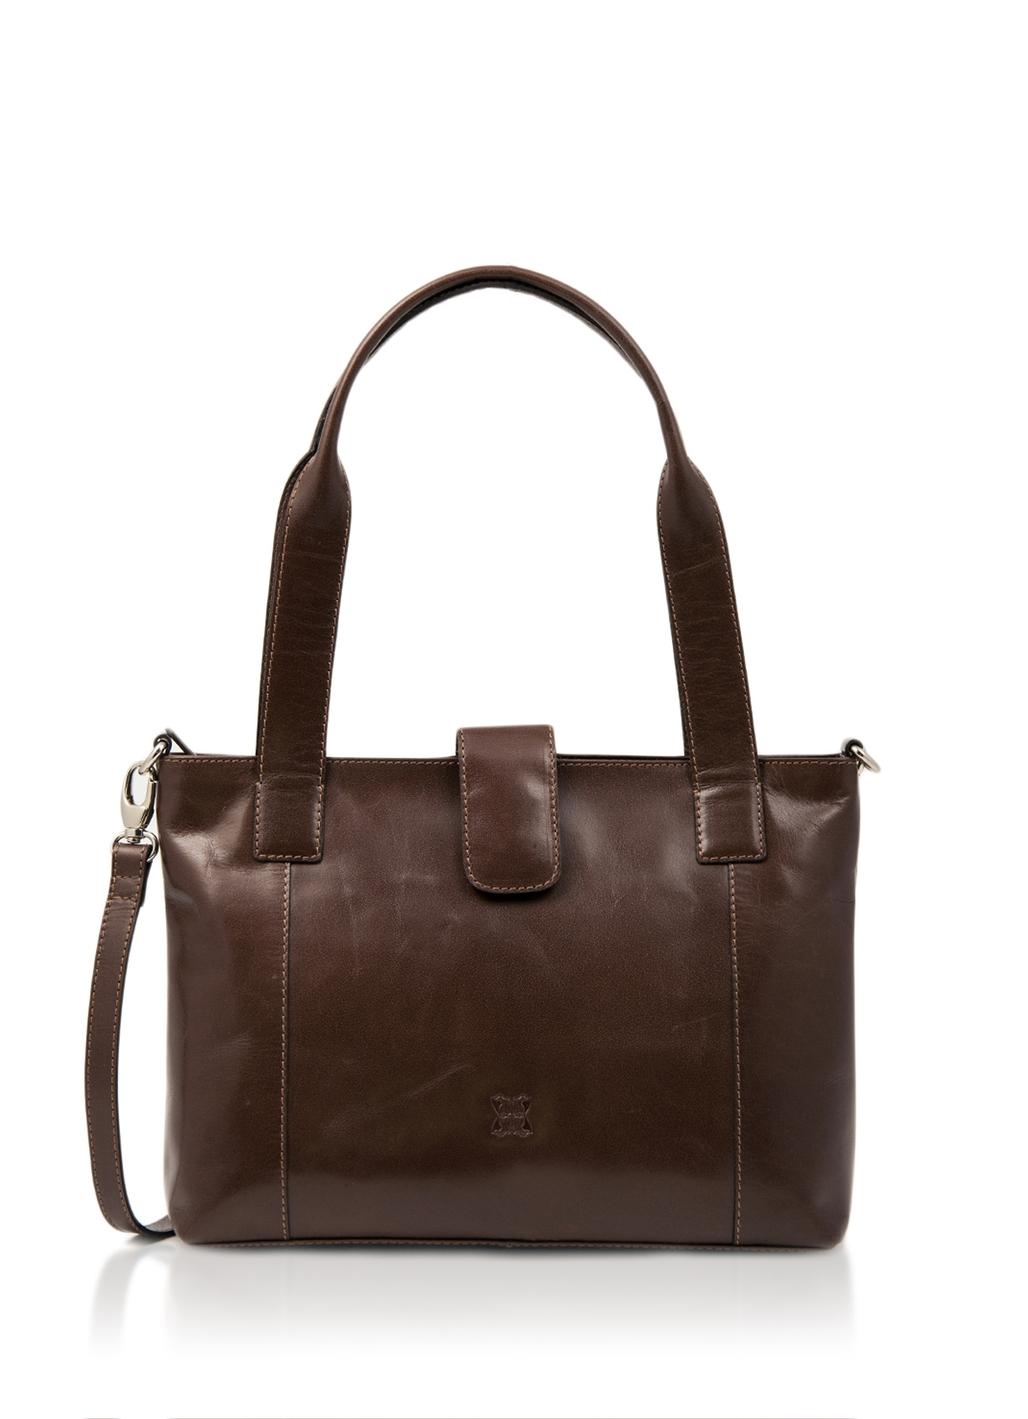 Bowland Leather Shoulder Bag in Brown